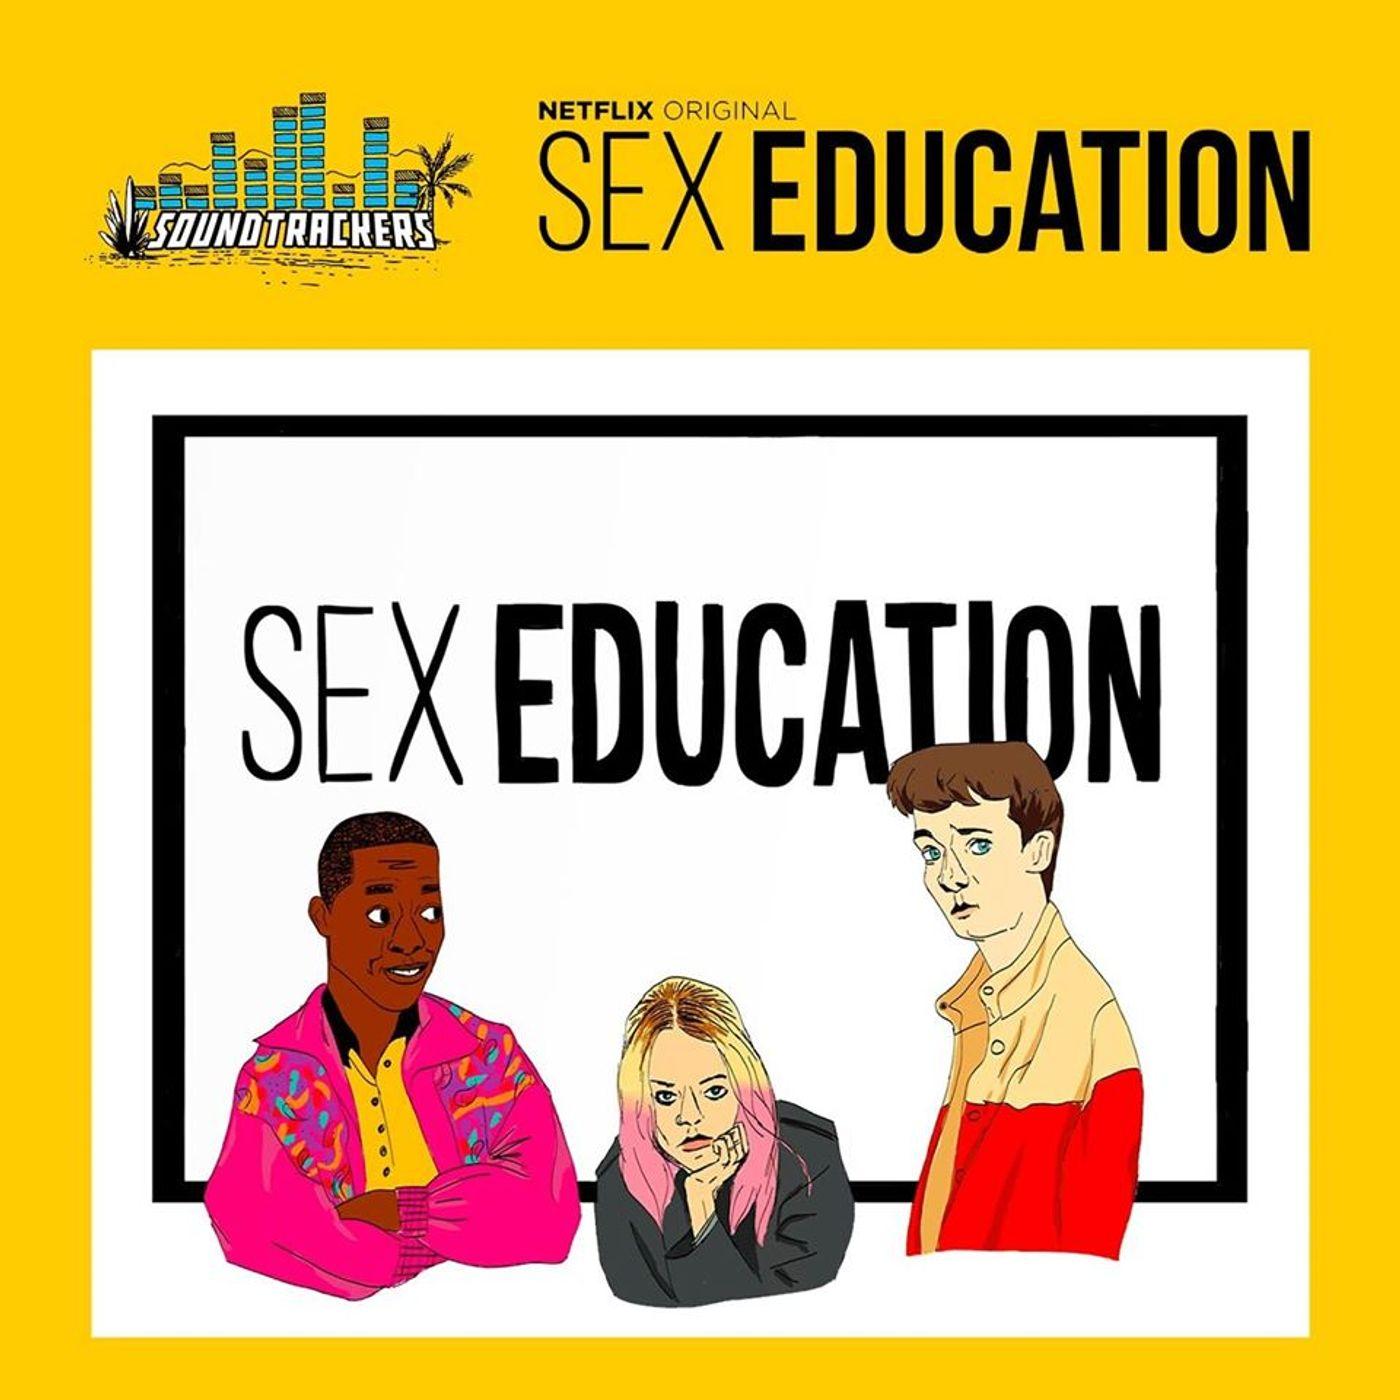 Episodio 11 - Sex Education